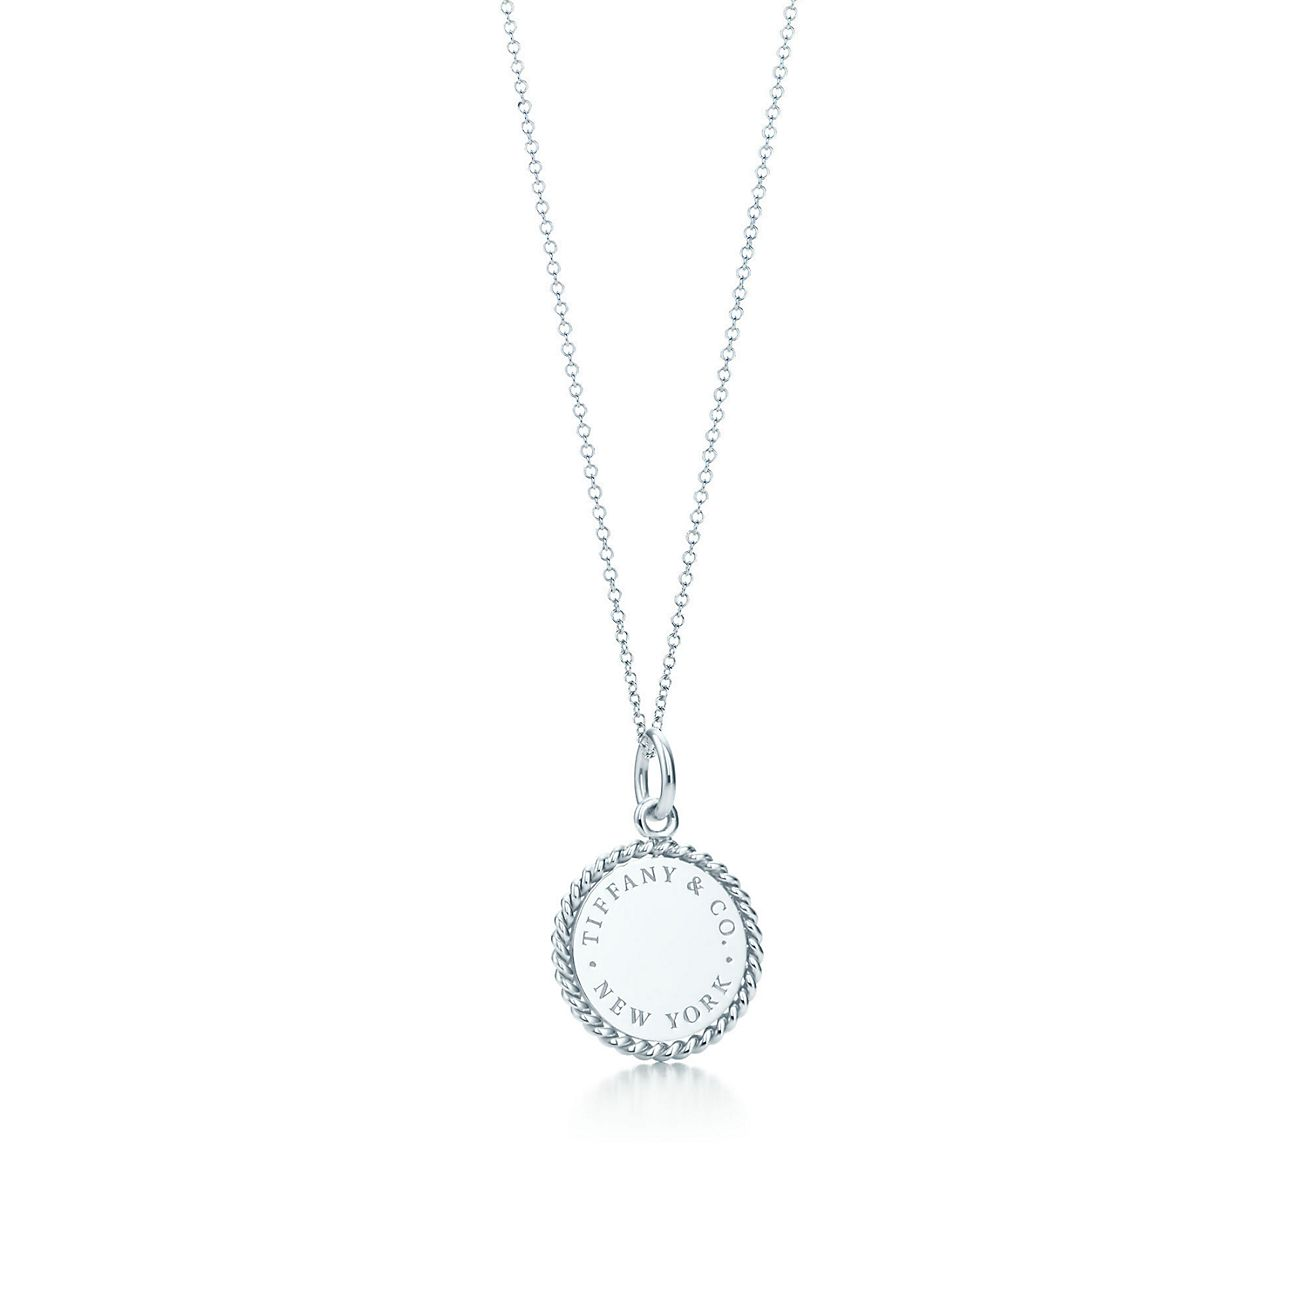 Tiffany Twist round charm in sterling silver, small Tiffany & Co.